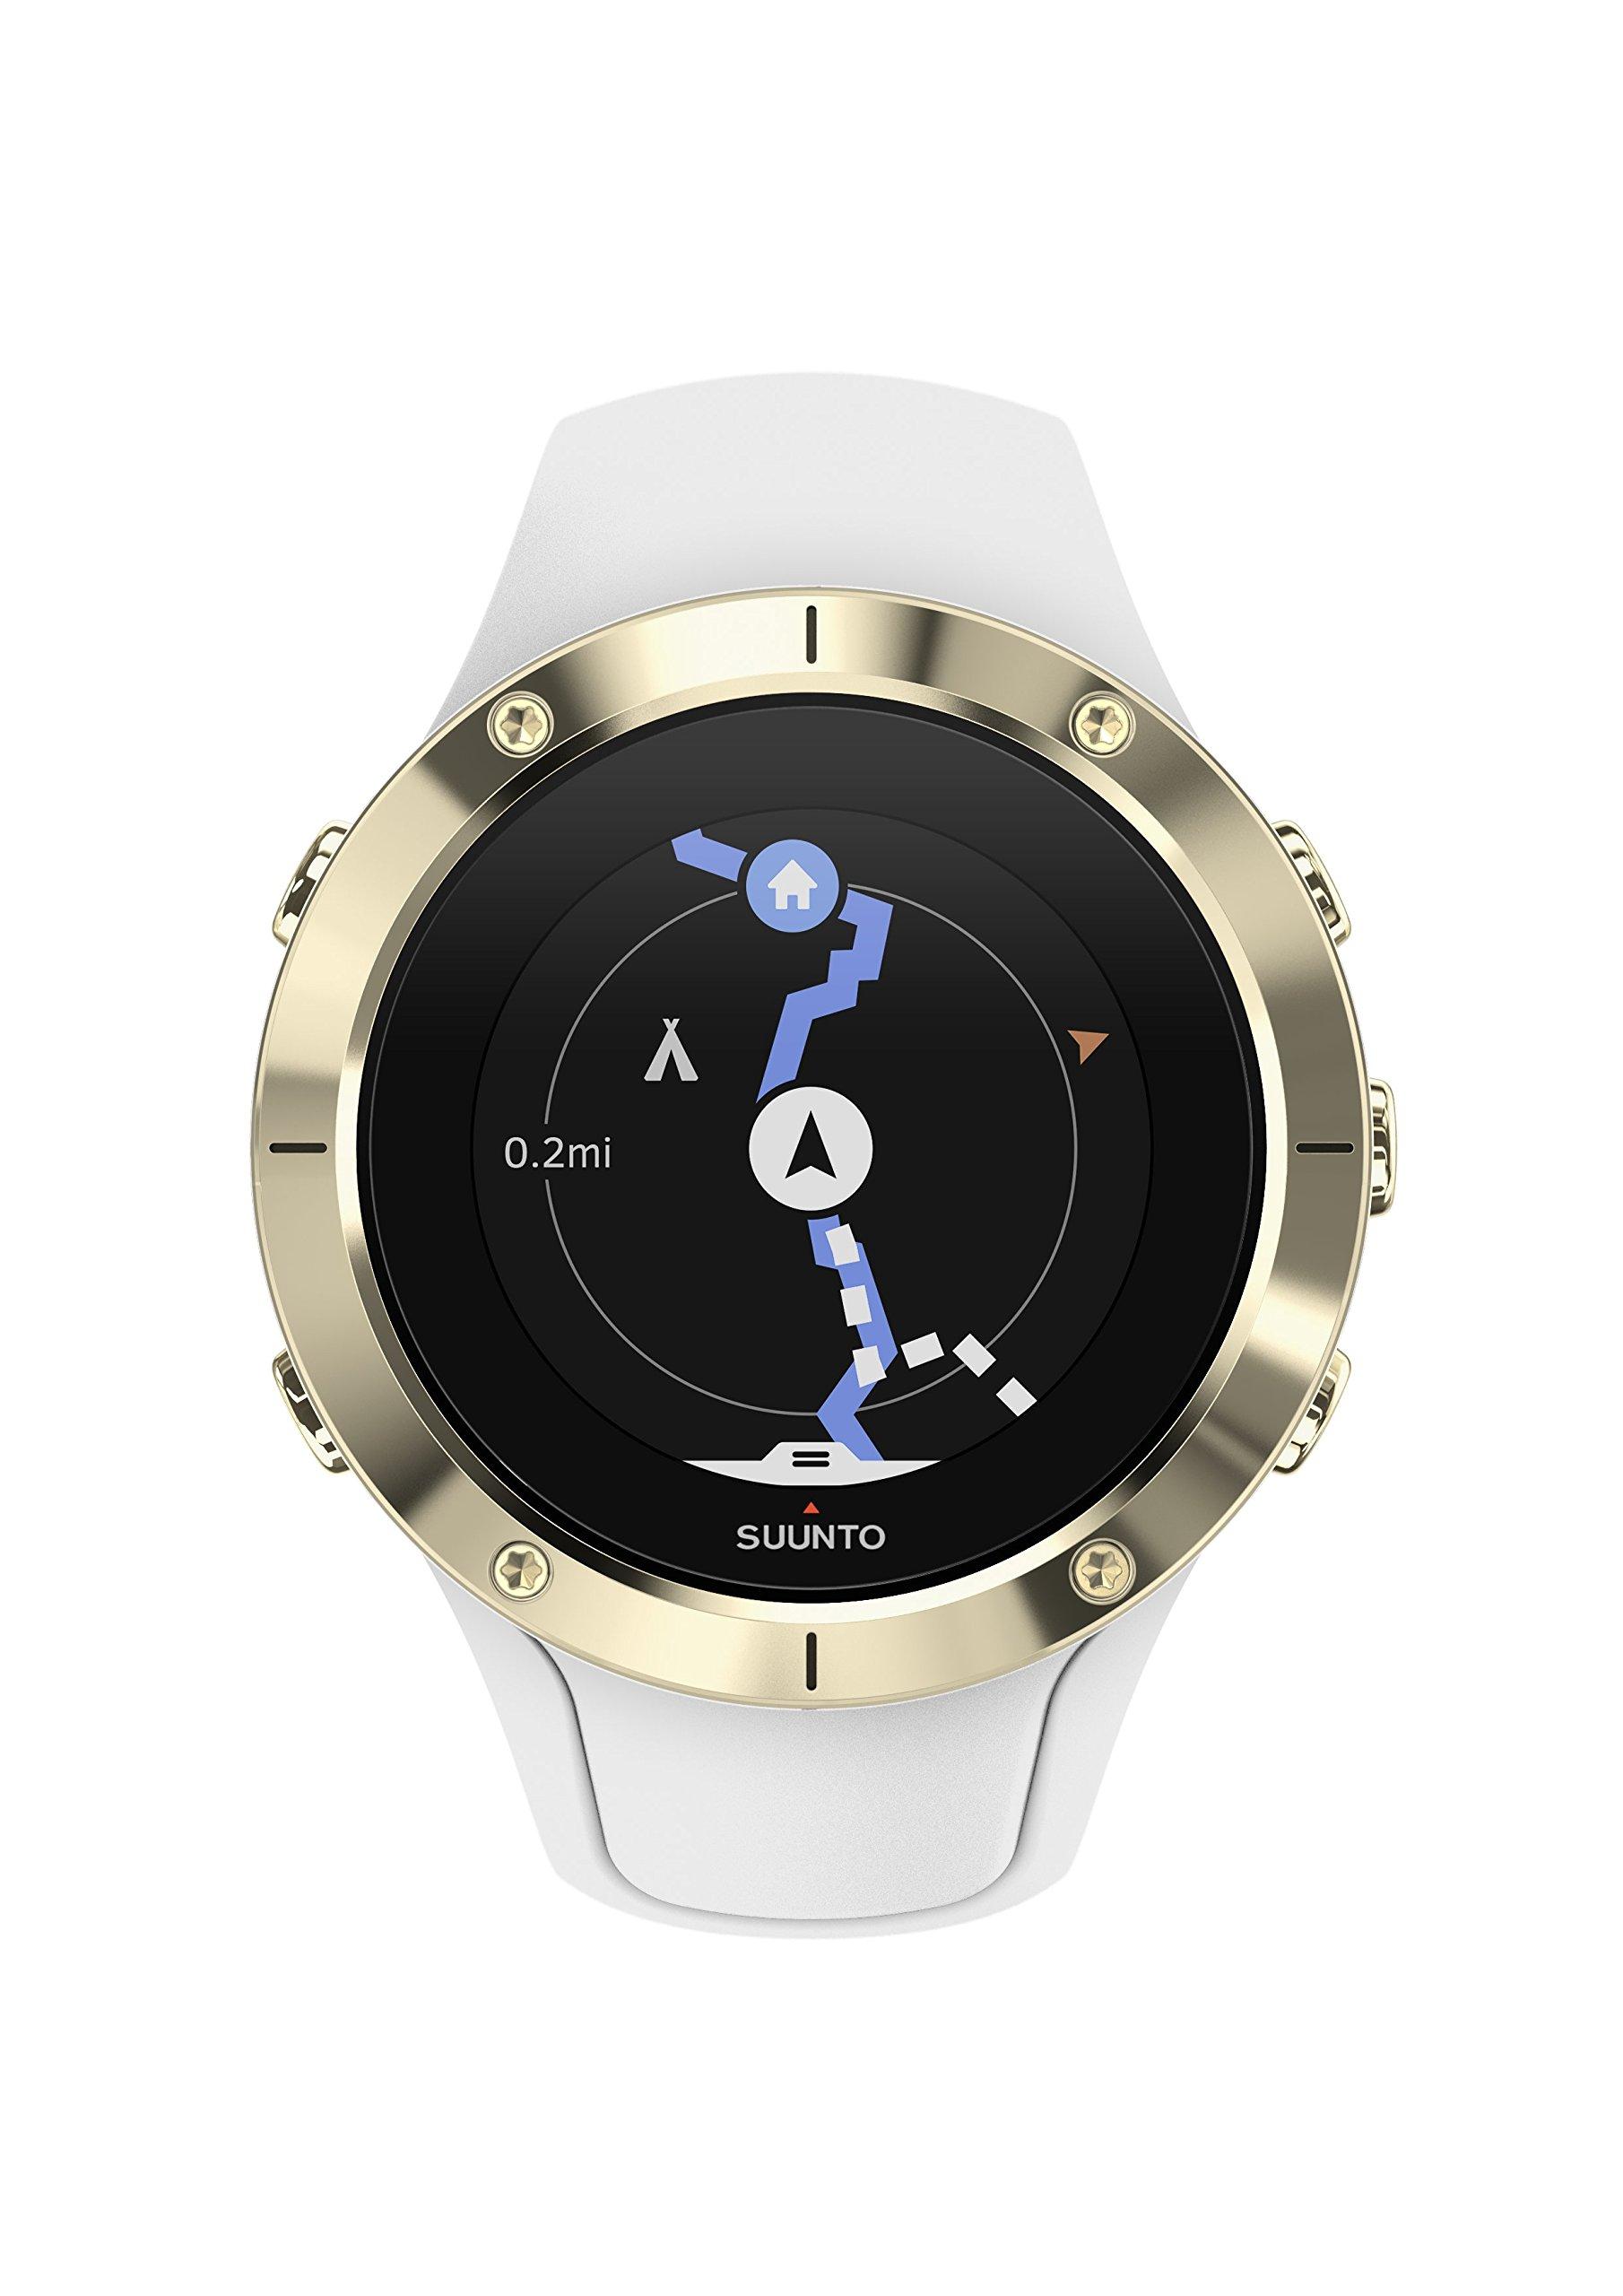 Suunto Spartan Trainer Wrist HR Multisport GPS Watch (Gold) by Suunto (Image #12)